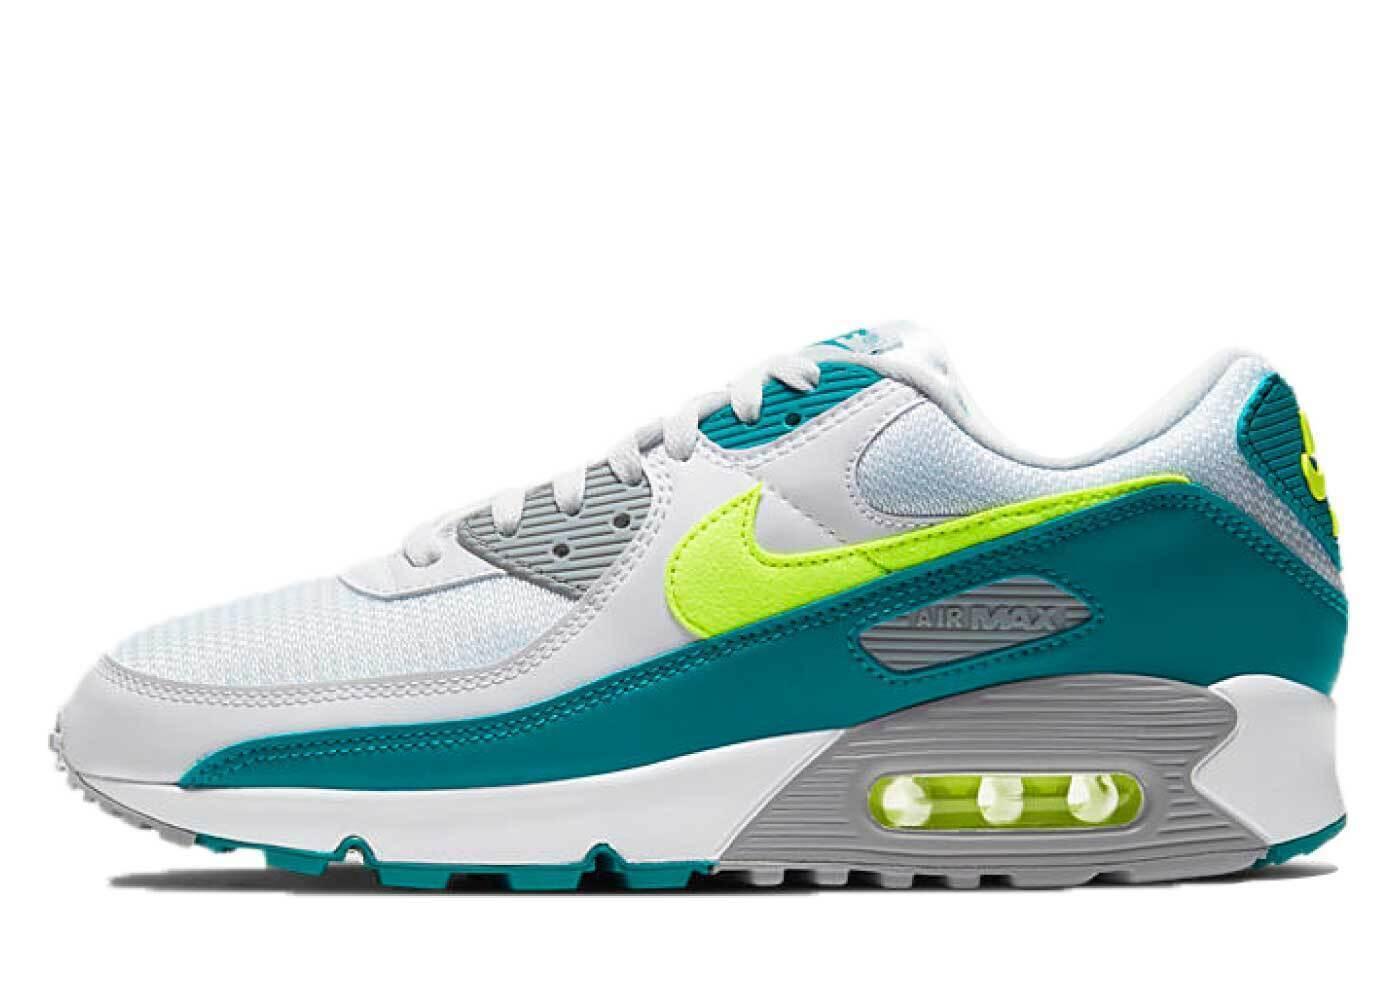 Nike Air Max 3 Hot Limeの写真